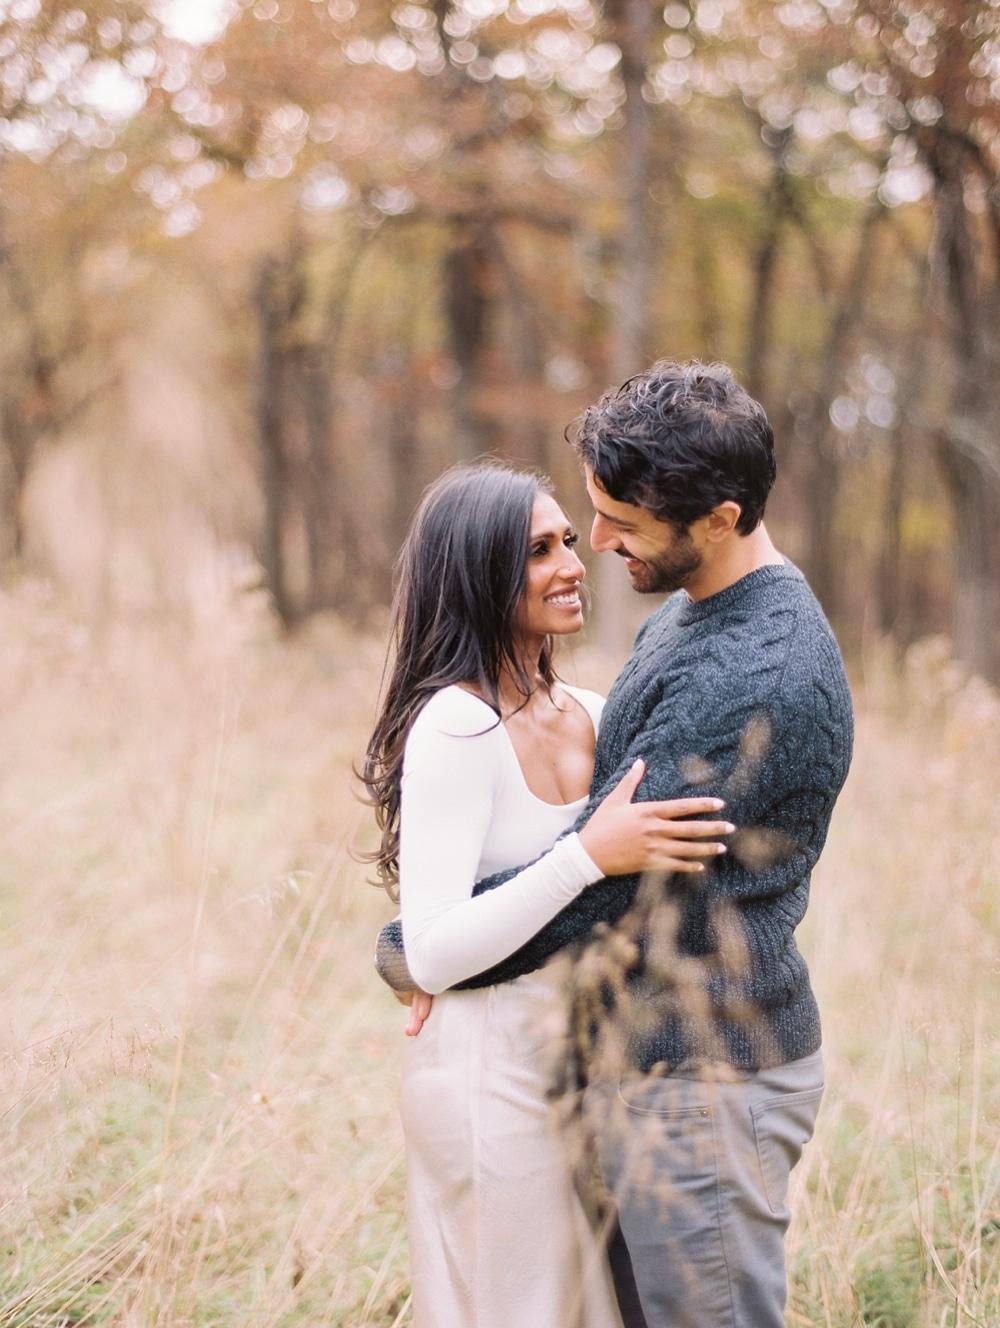 Kristin-La-Voie-Photography-morton-arboretum-chicago-wedding-photographer-82